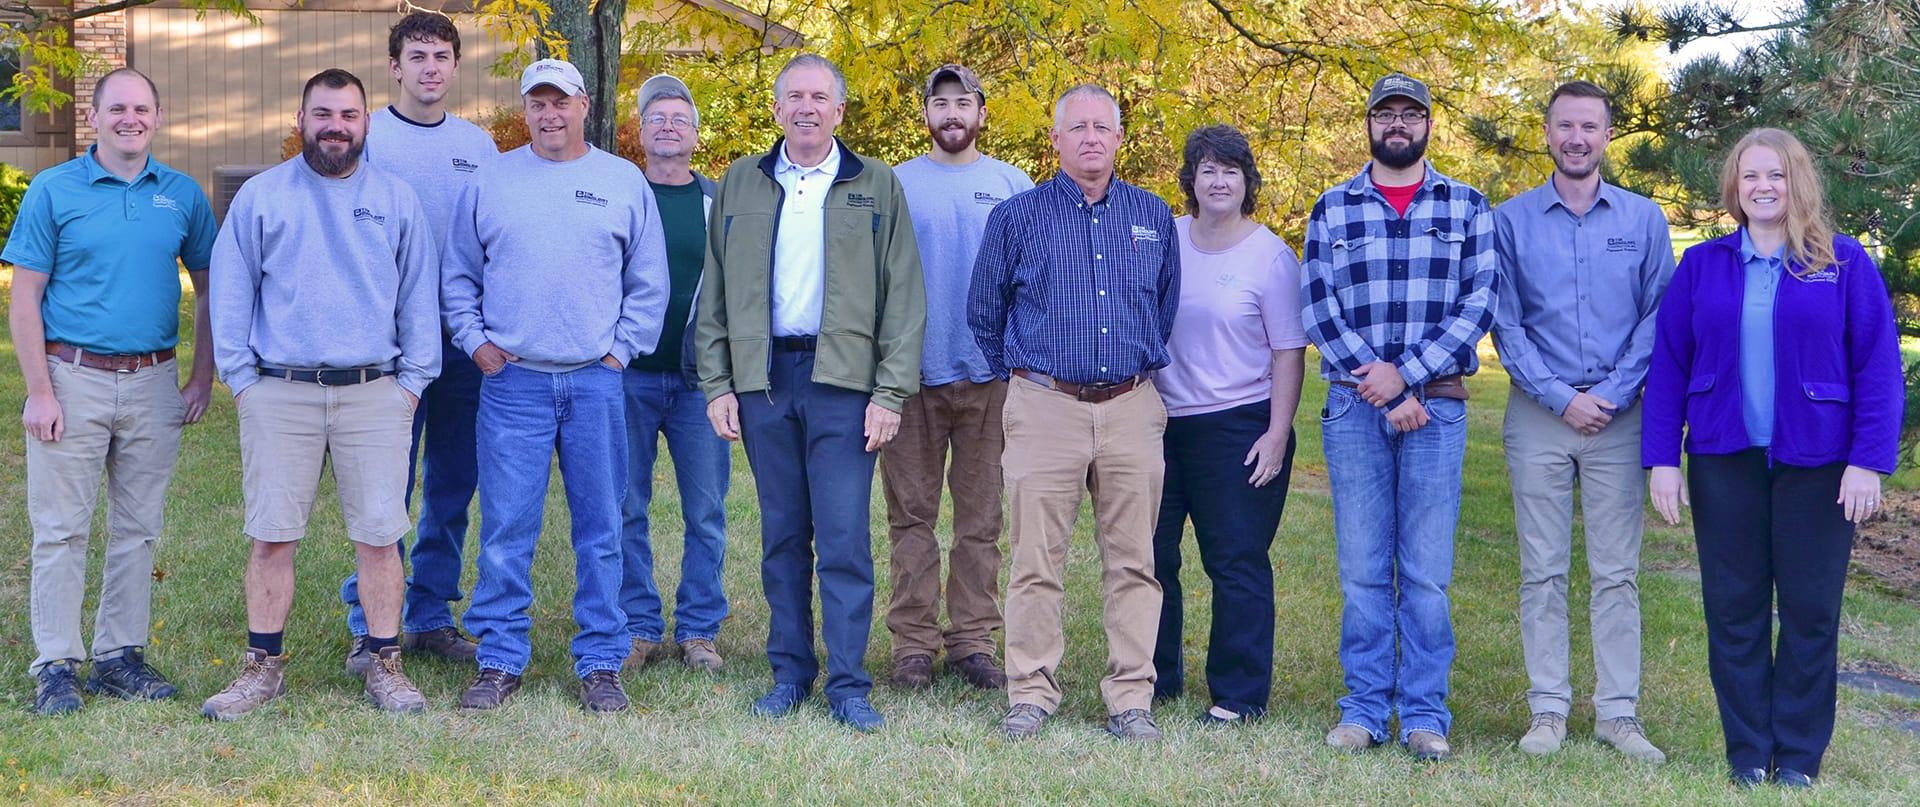 Company staff group photo